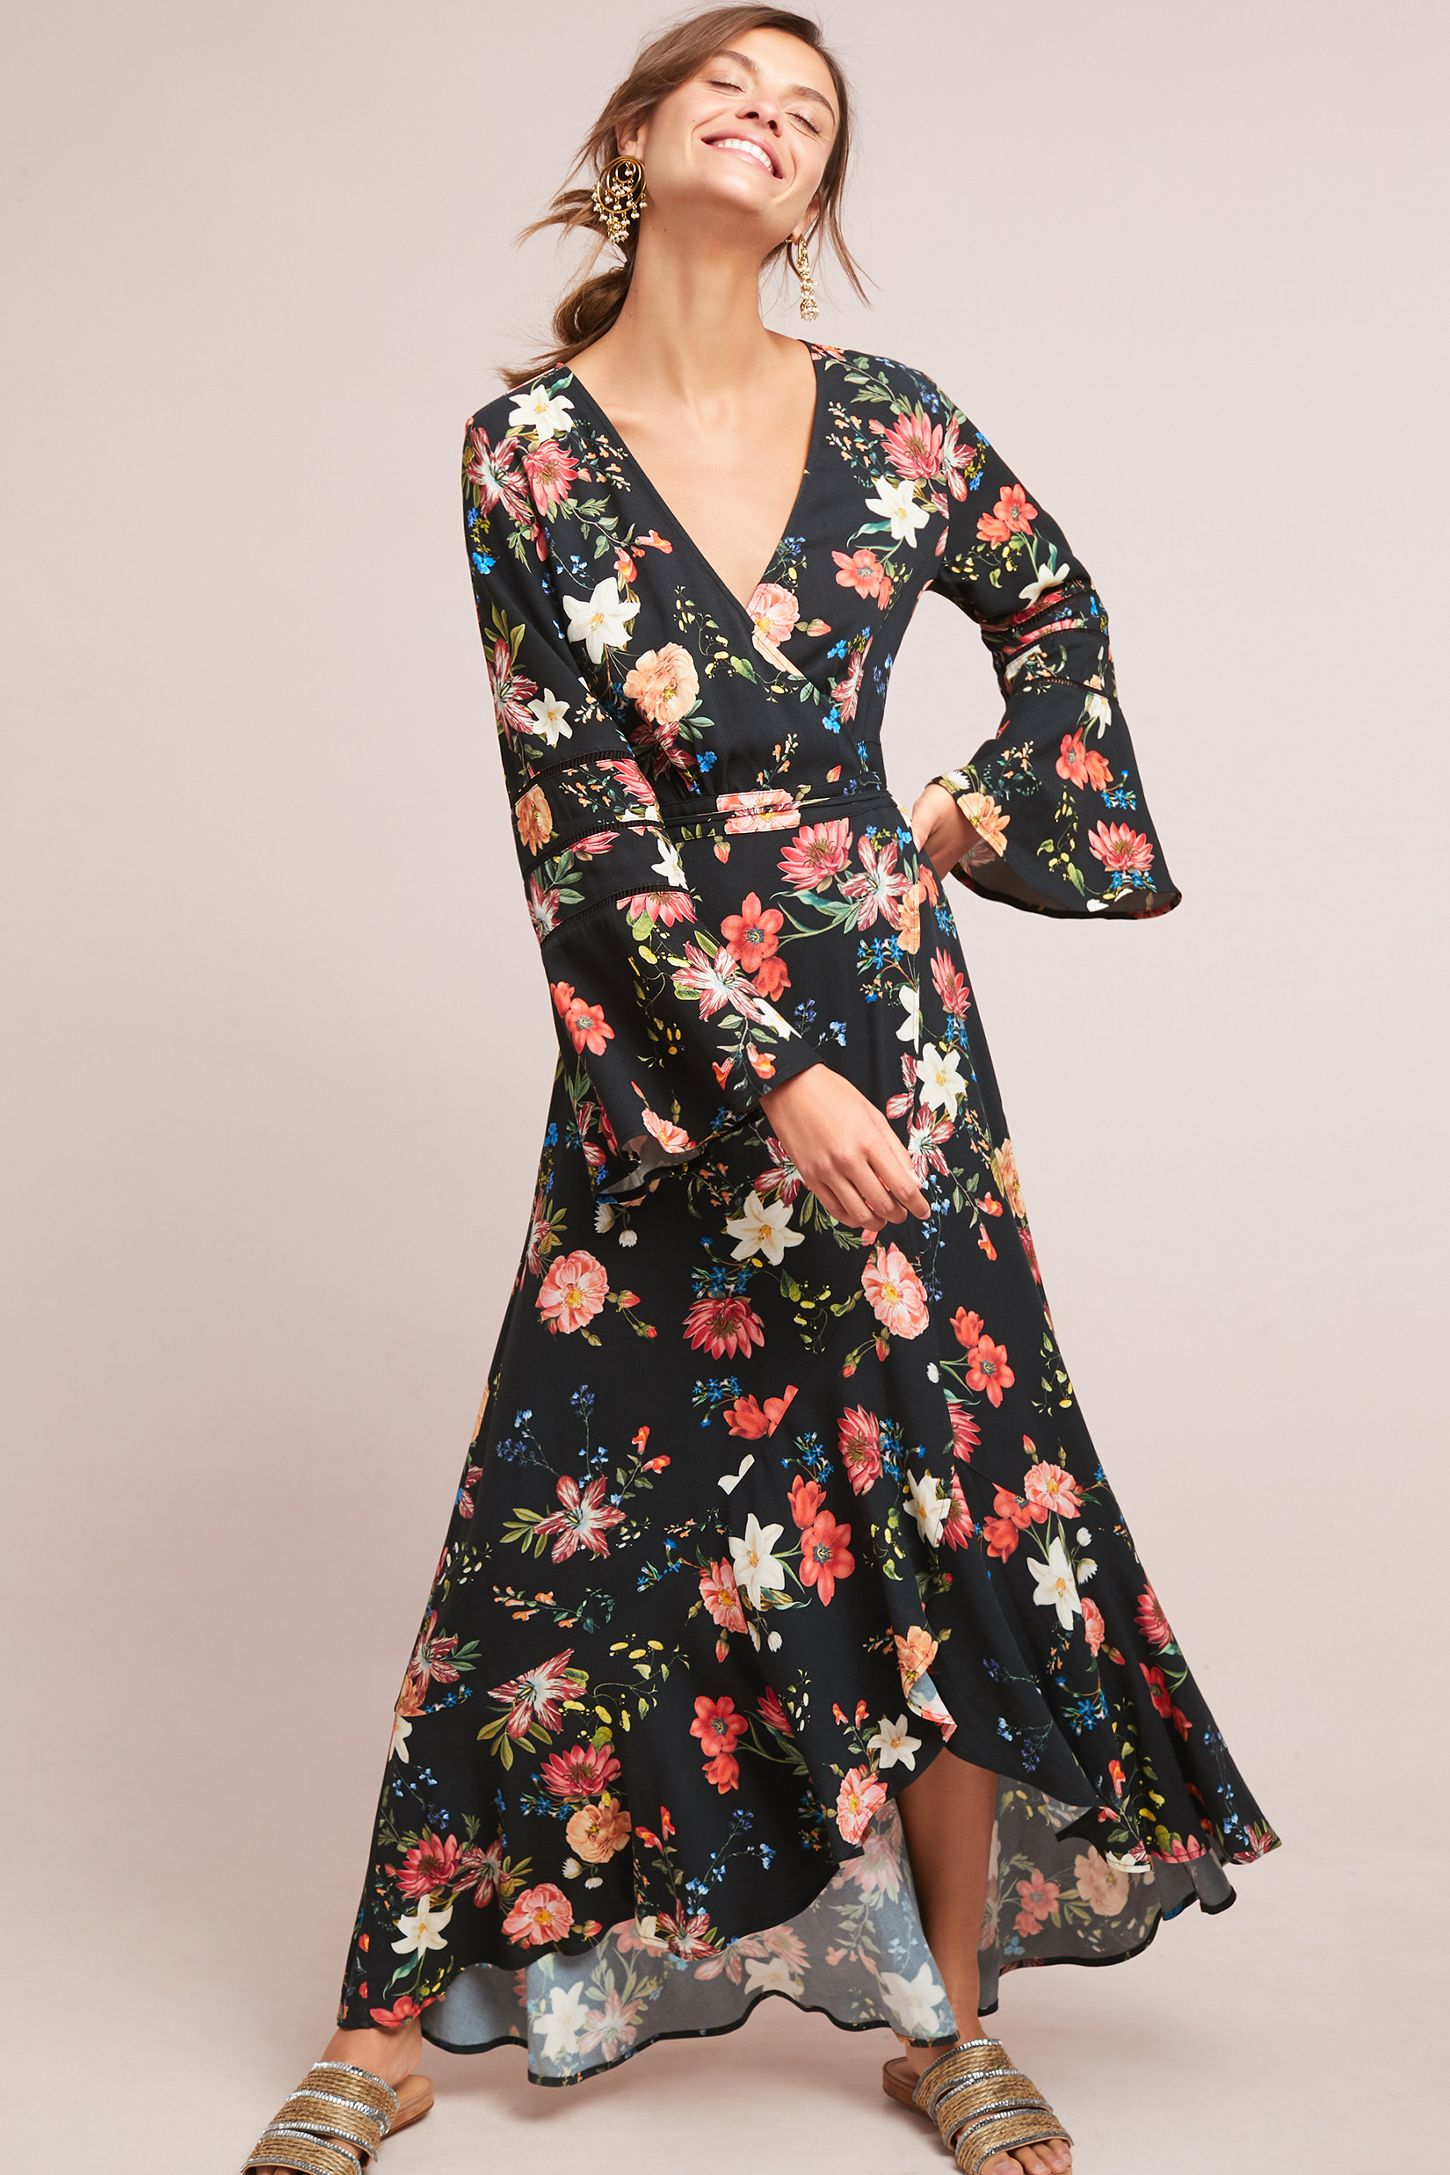 2721a203871a4 Farm Rio Summer Flower Wrap Dress | Anthropologie